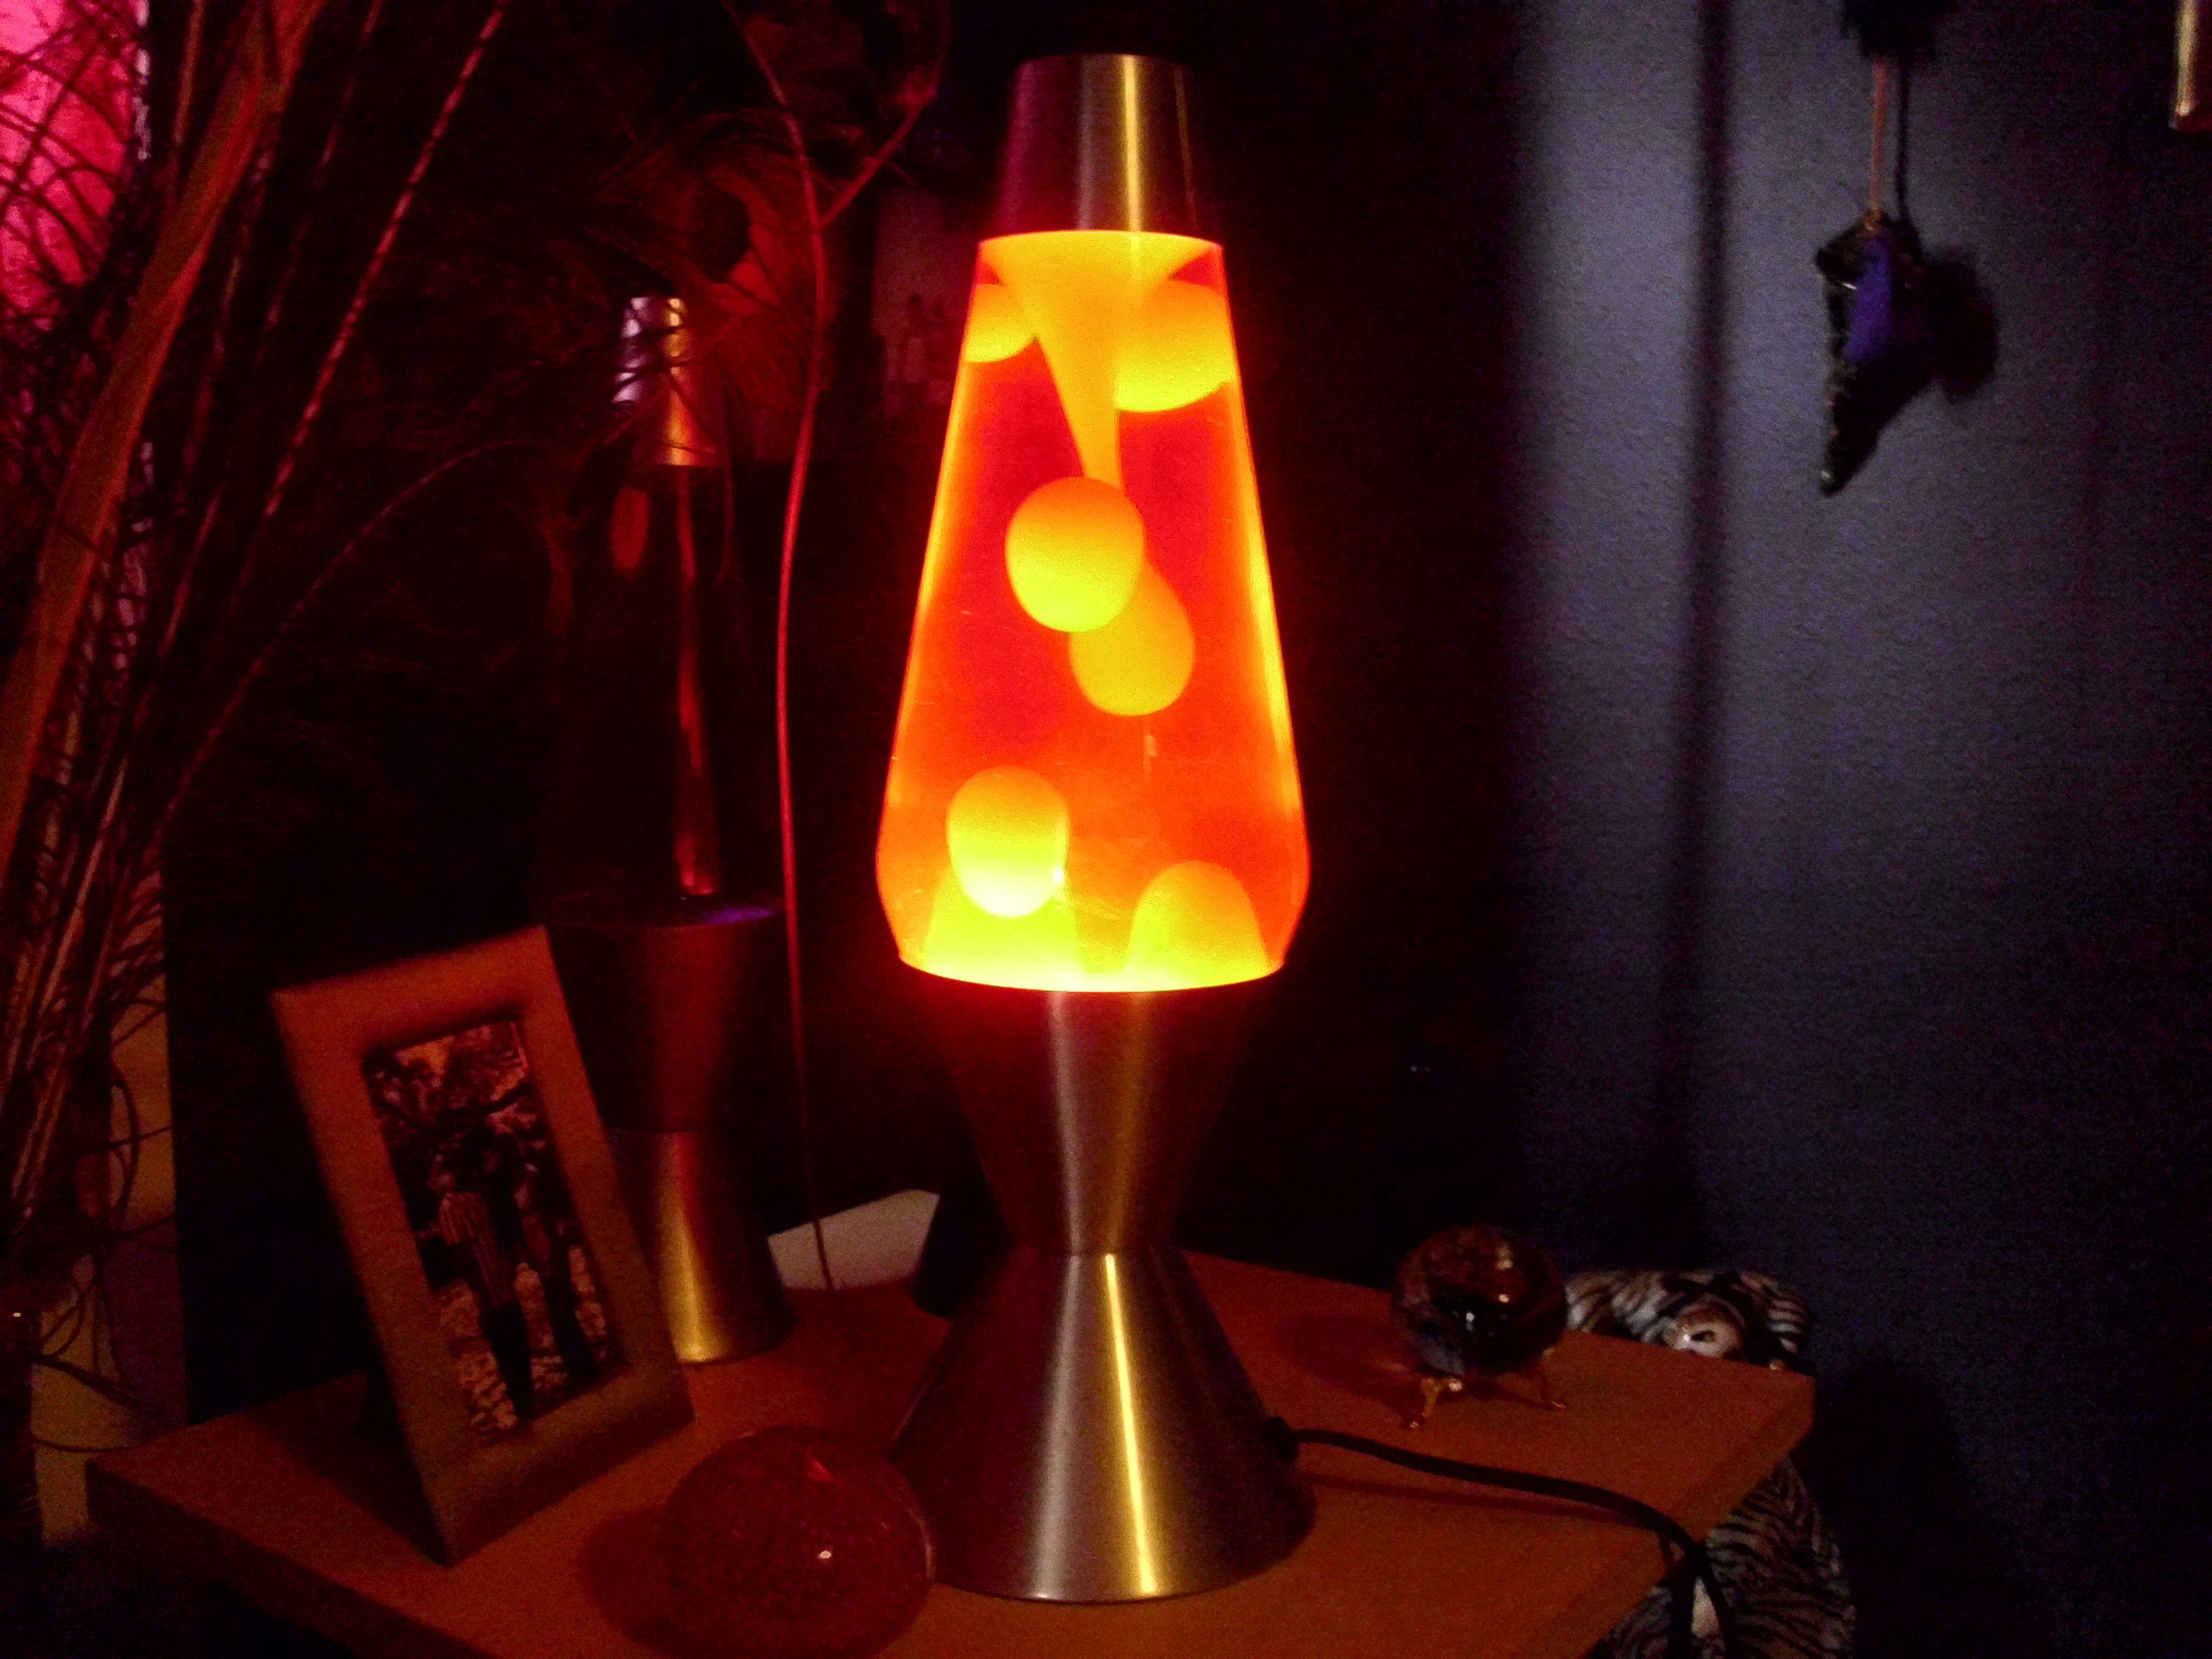 Lava lamp overnight - Lightning Lavalamp